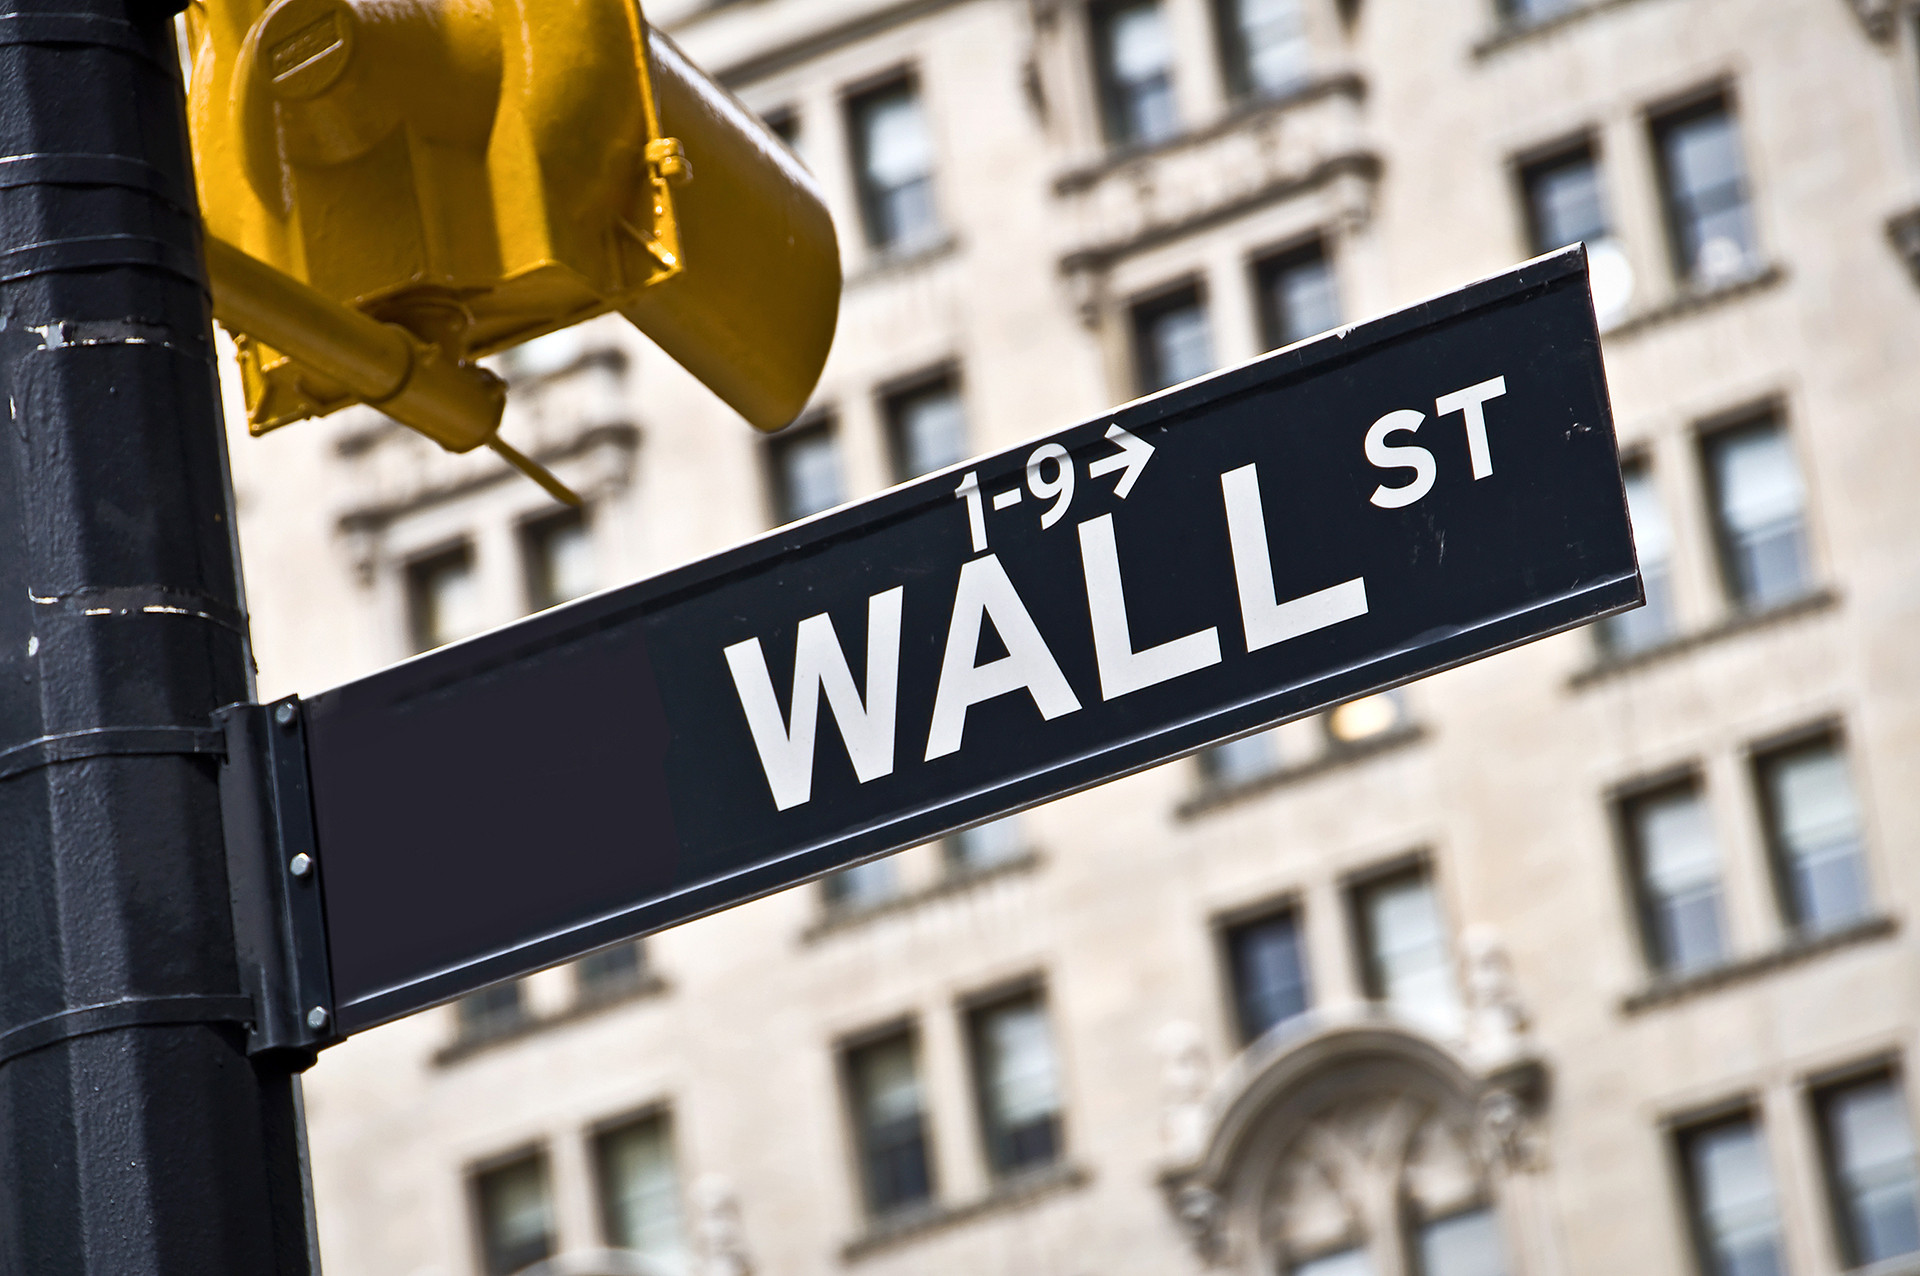 Wall Street Sightseeing Tour